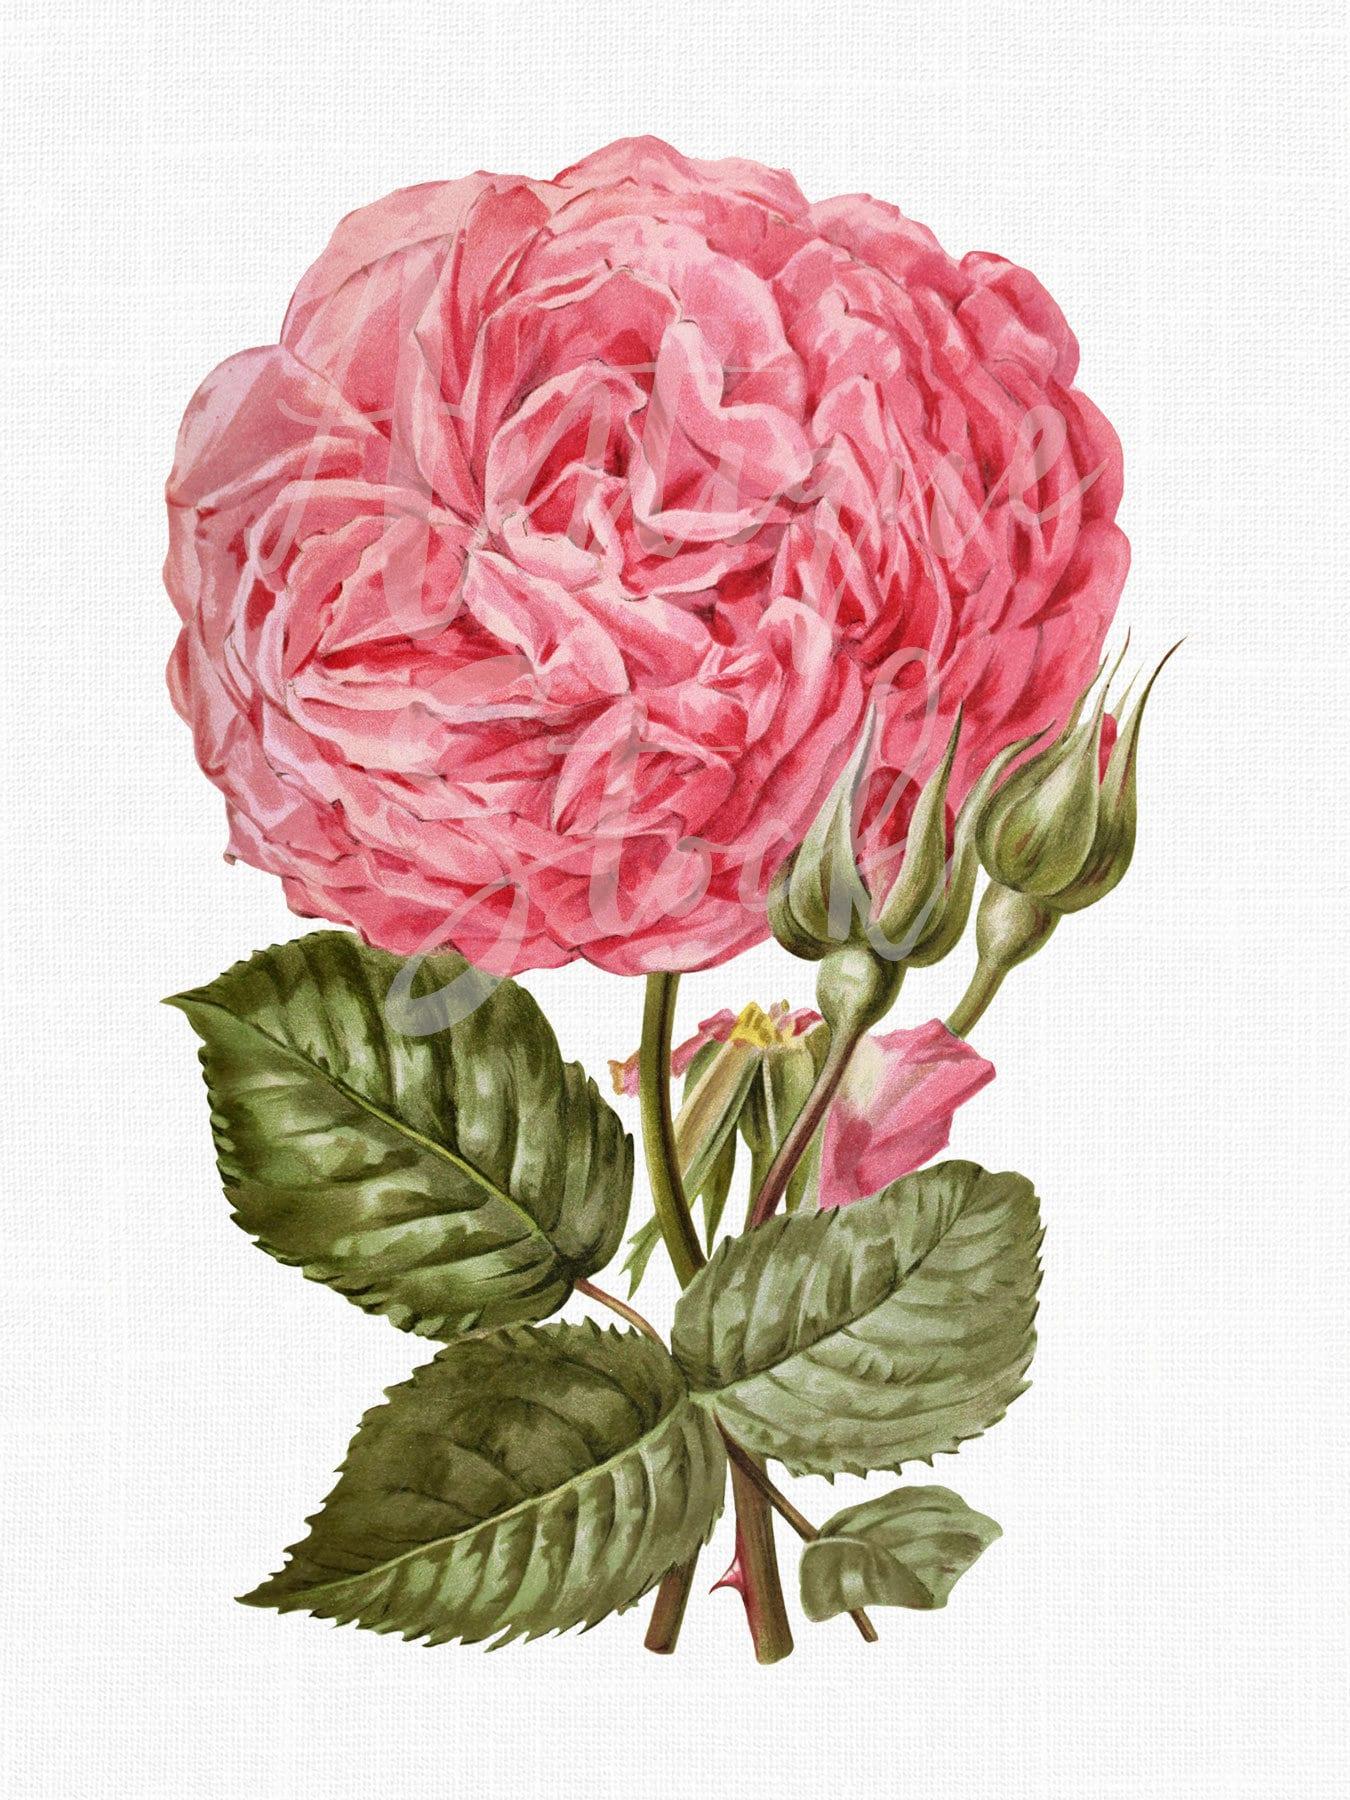 Rose Clip Art Flower Image Botanical Illustration Mme Etsy